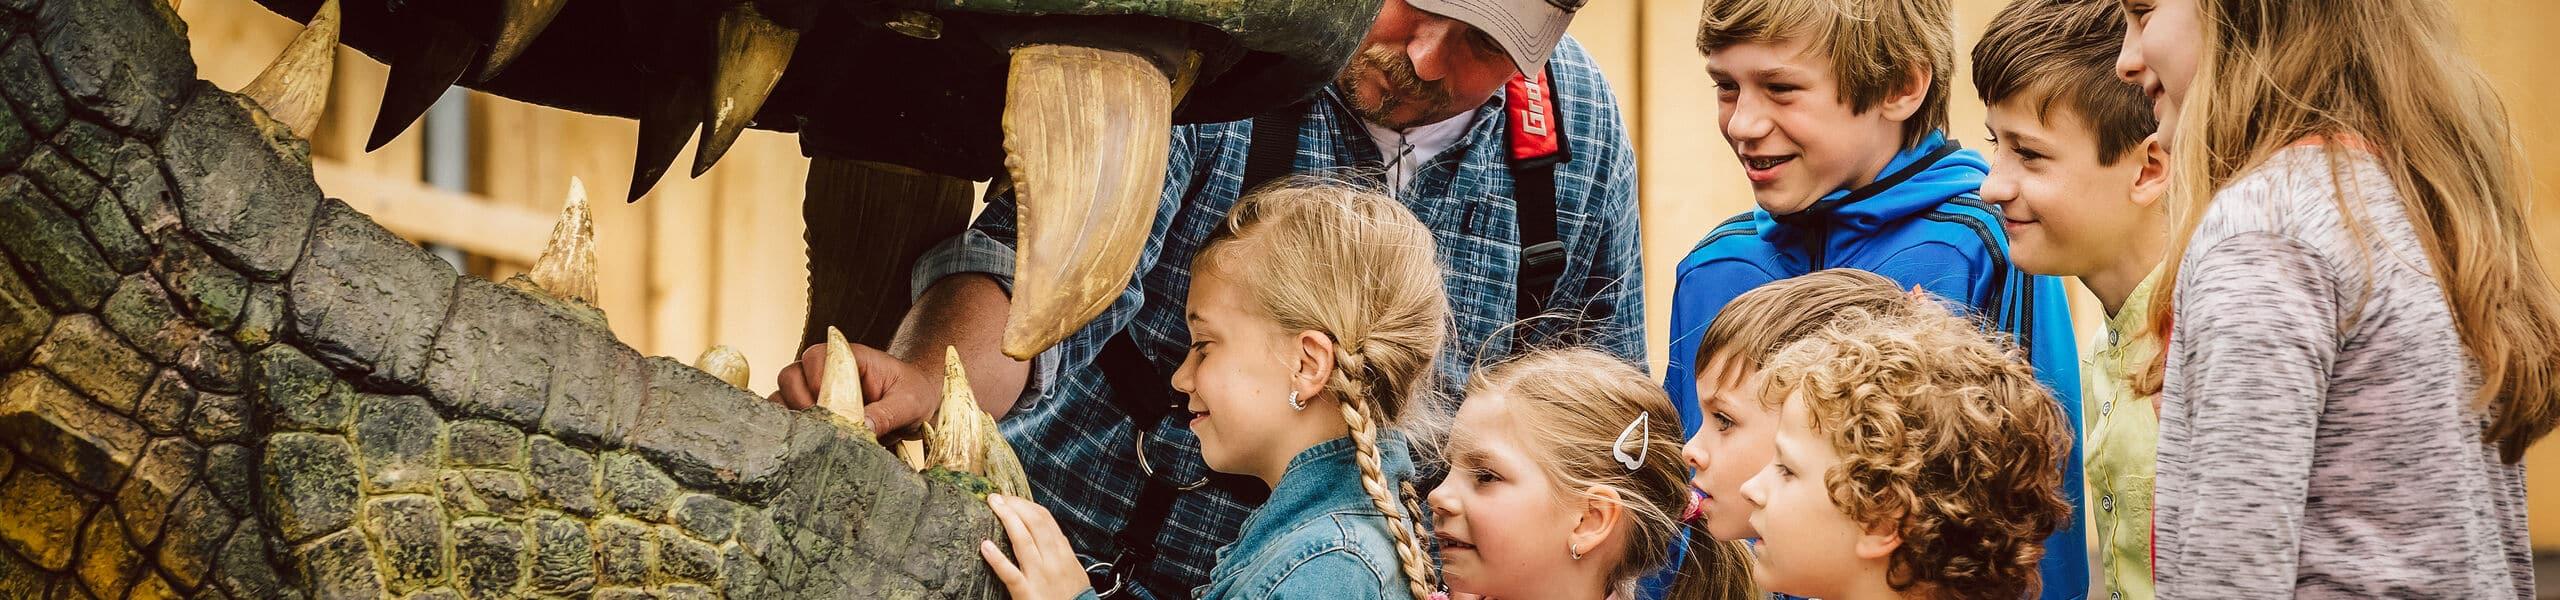 Kinder schauen ins Maul des berühmten Further Drachens